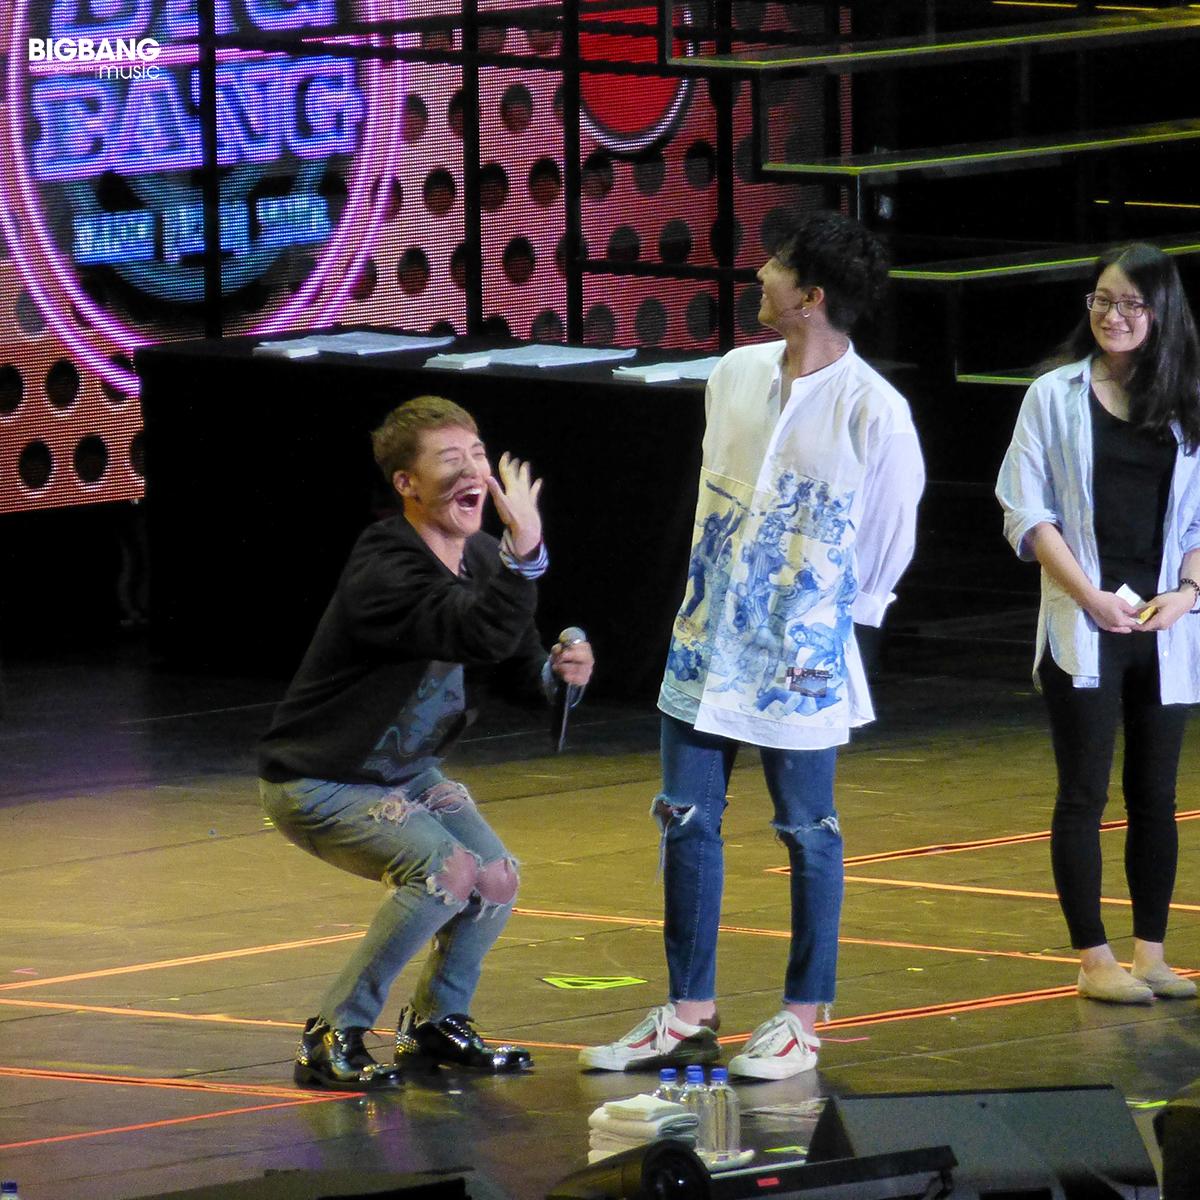 BIGBANGmusic-BIGBANG-FM-Hong-Kong-Day-2-2016-07-23-15